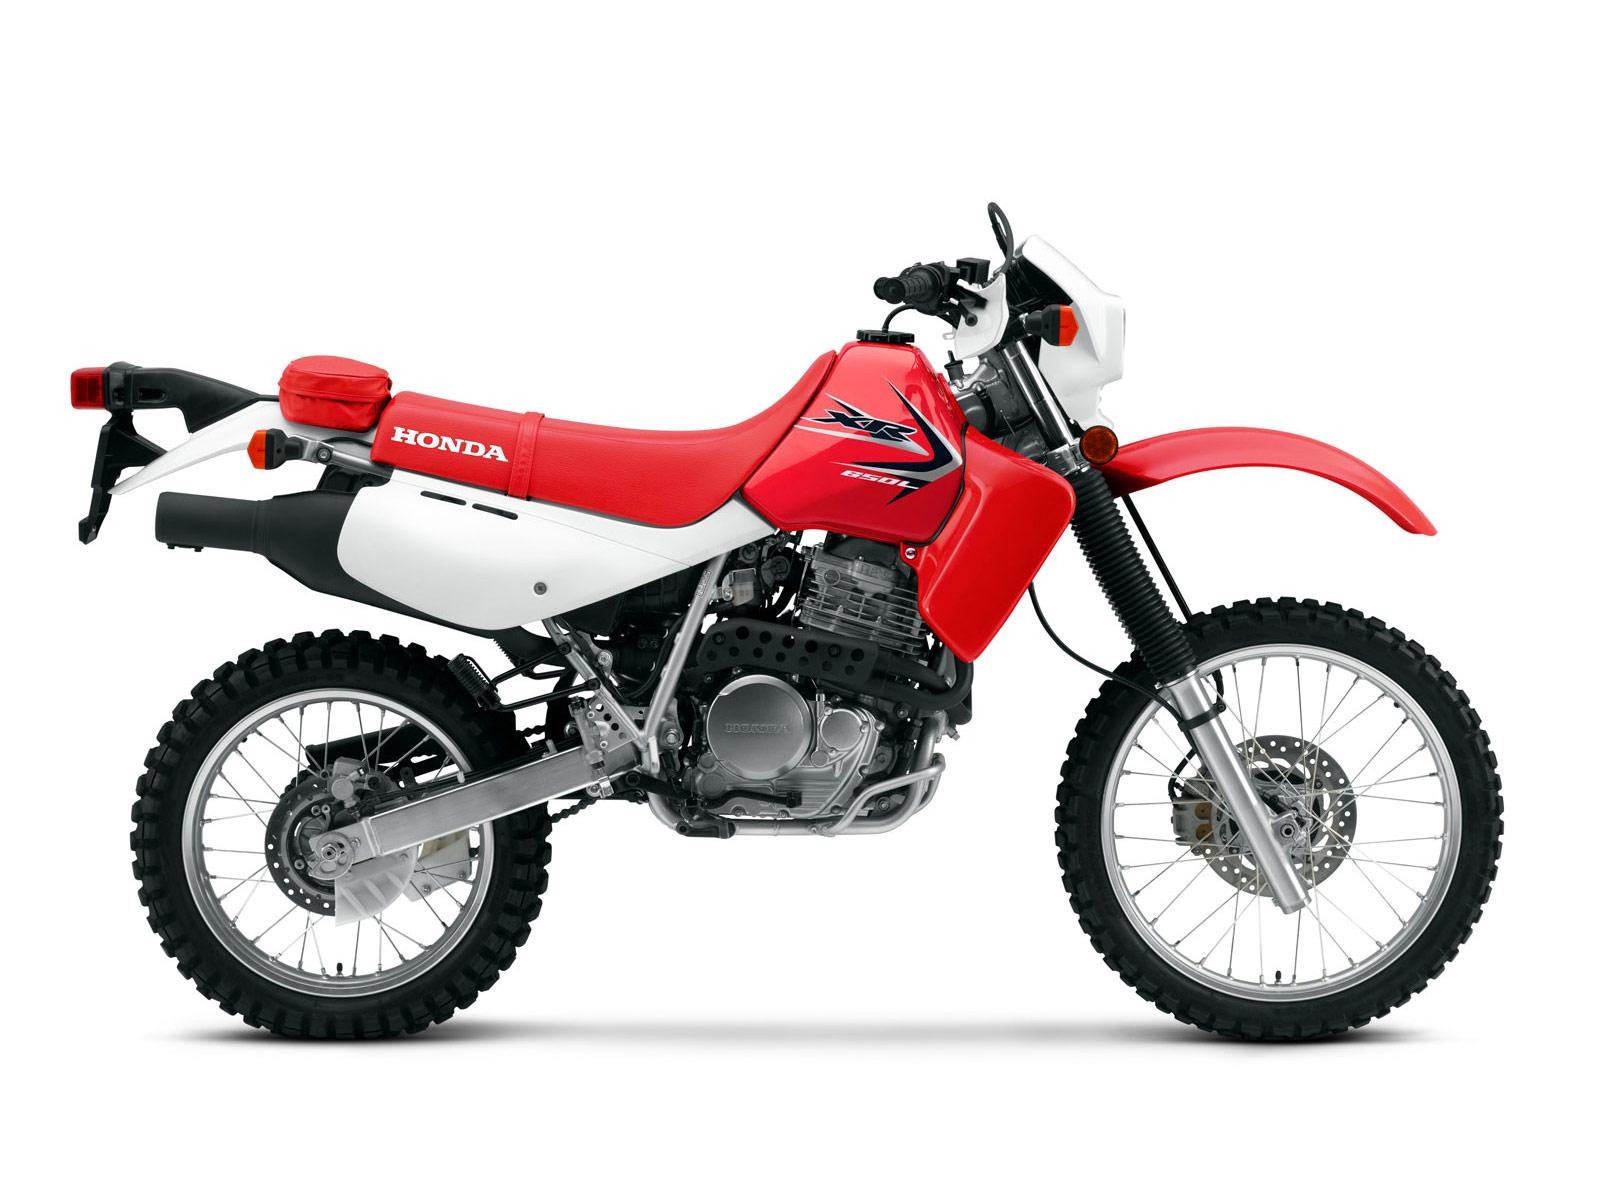 http://2.bp.blogspot.com/-ZqXhwLAEO_s/TqDjrC8R62I/AAAAAAAAJfc/Lk7o54ioK14/s1600/2012-Honda-XR650L-motorcycle-desktop-wallpapers.jpg